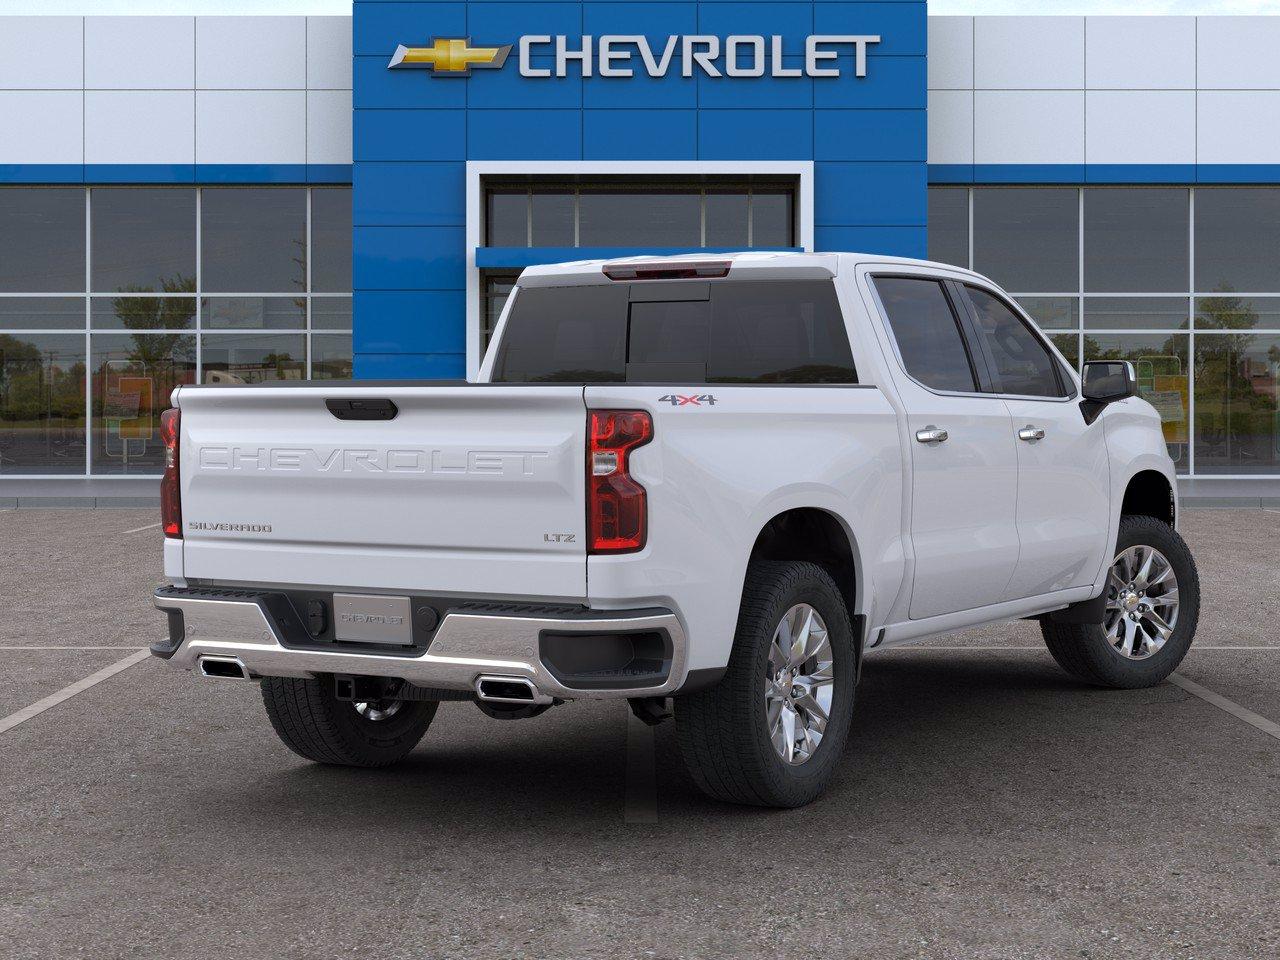 2020 Chevrolet Silverado 1500 Crew Cab 4x4, Pickup #C201404 - photo 2